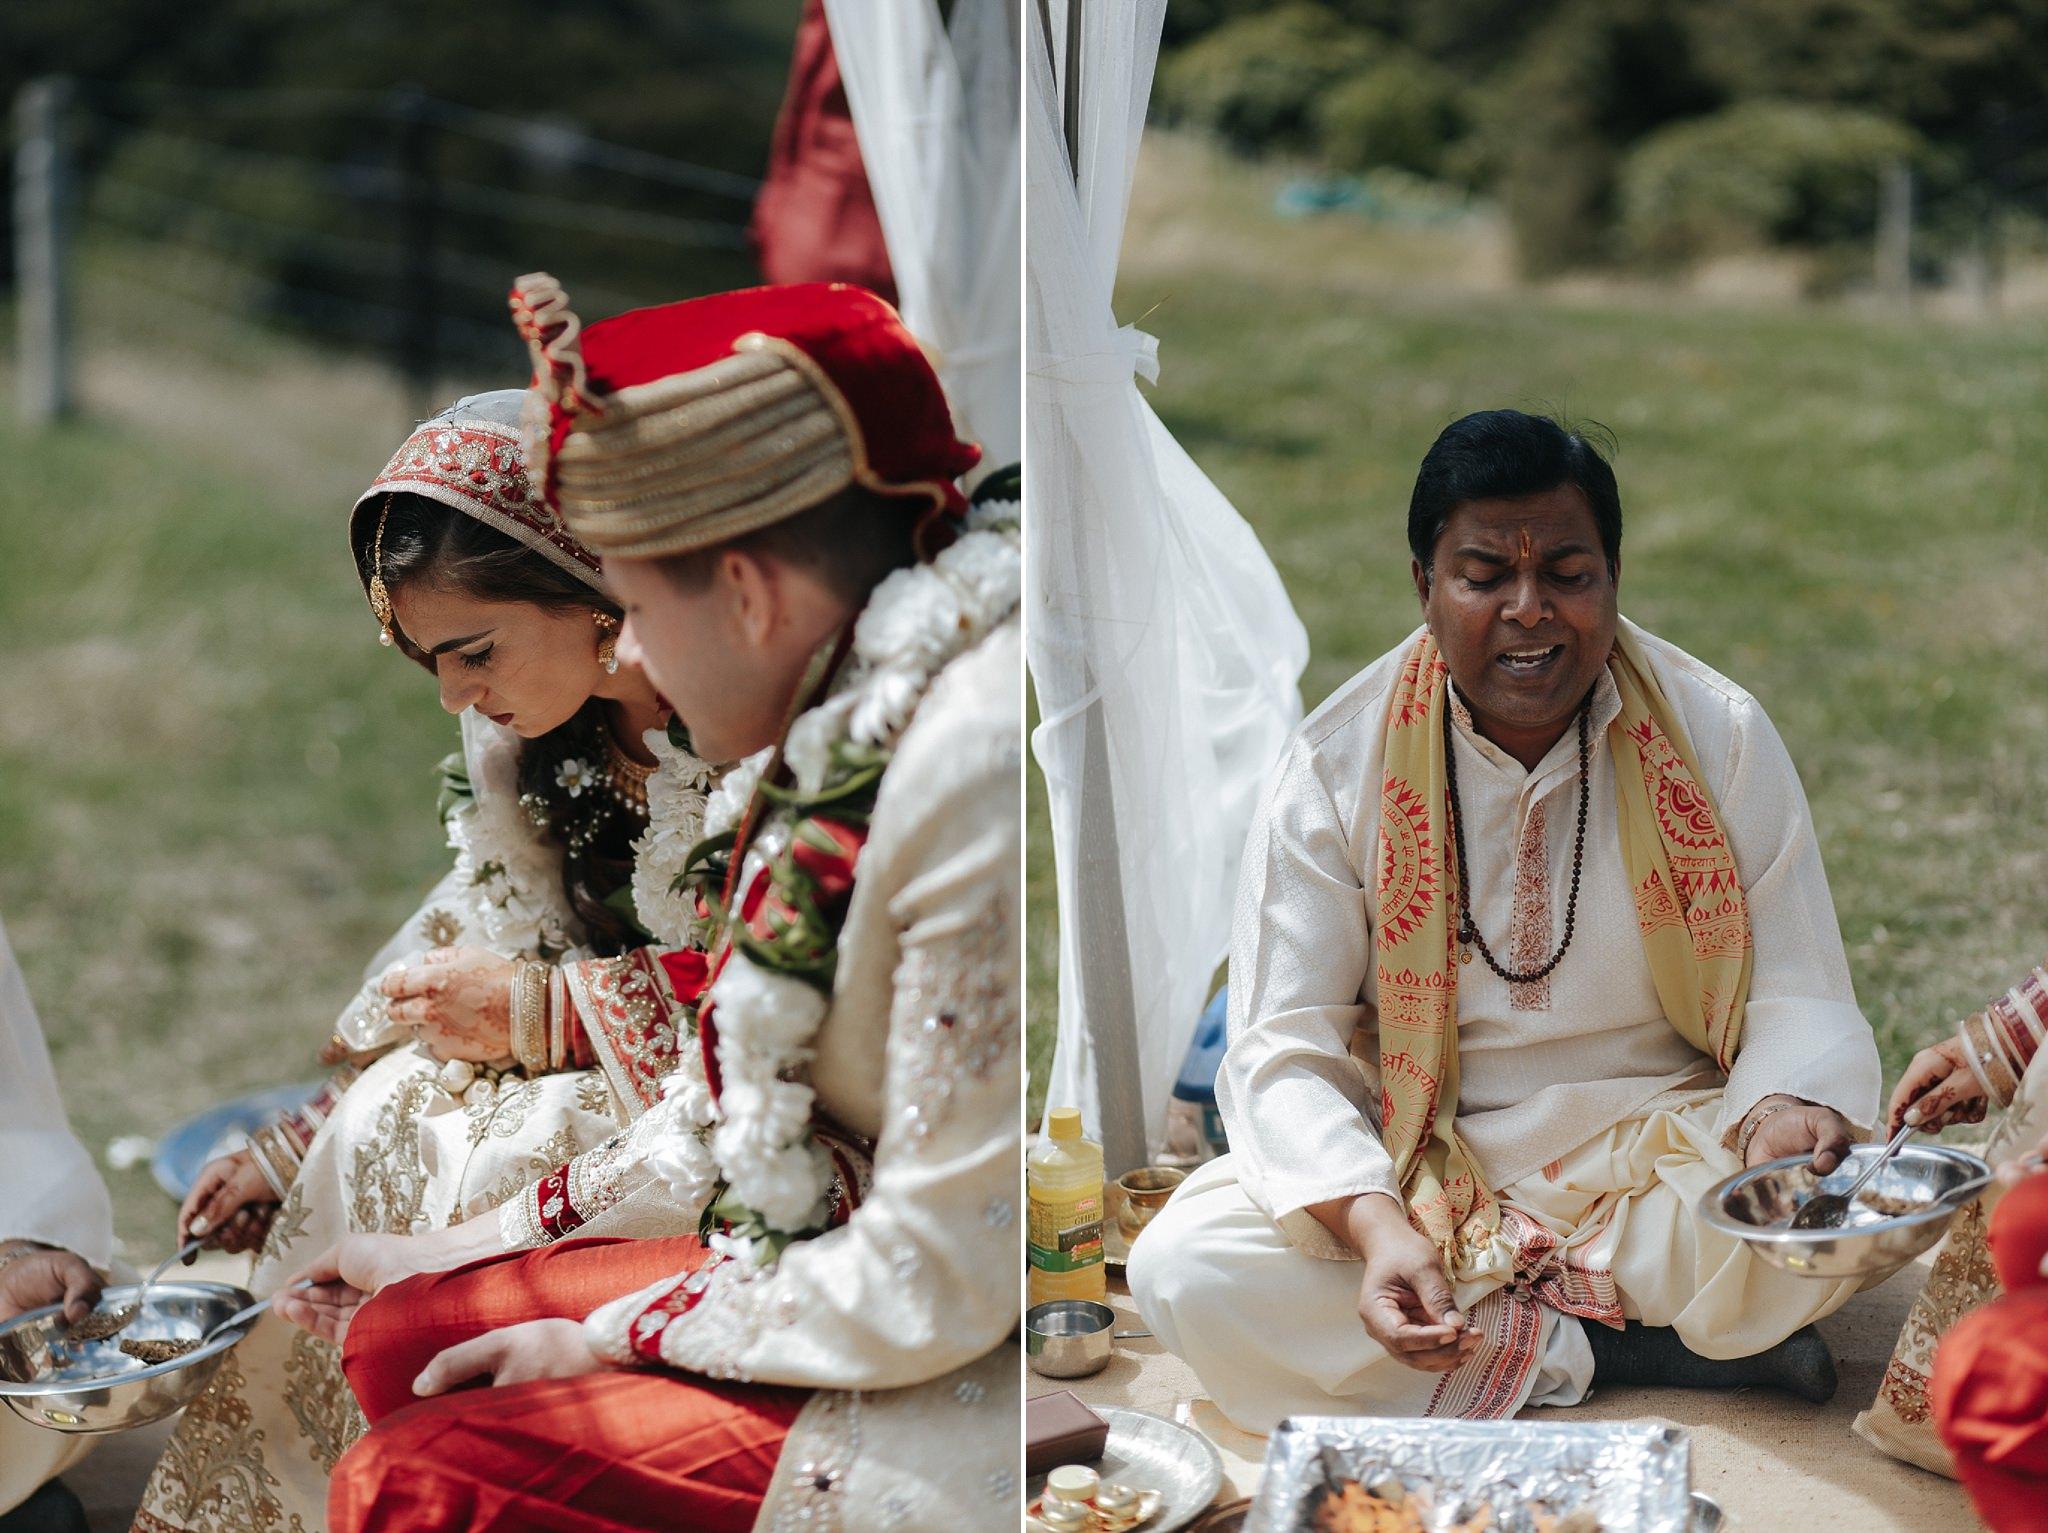 wainui-wedding-blog-aaronsami-95.jpg